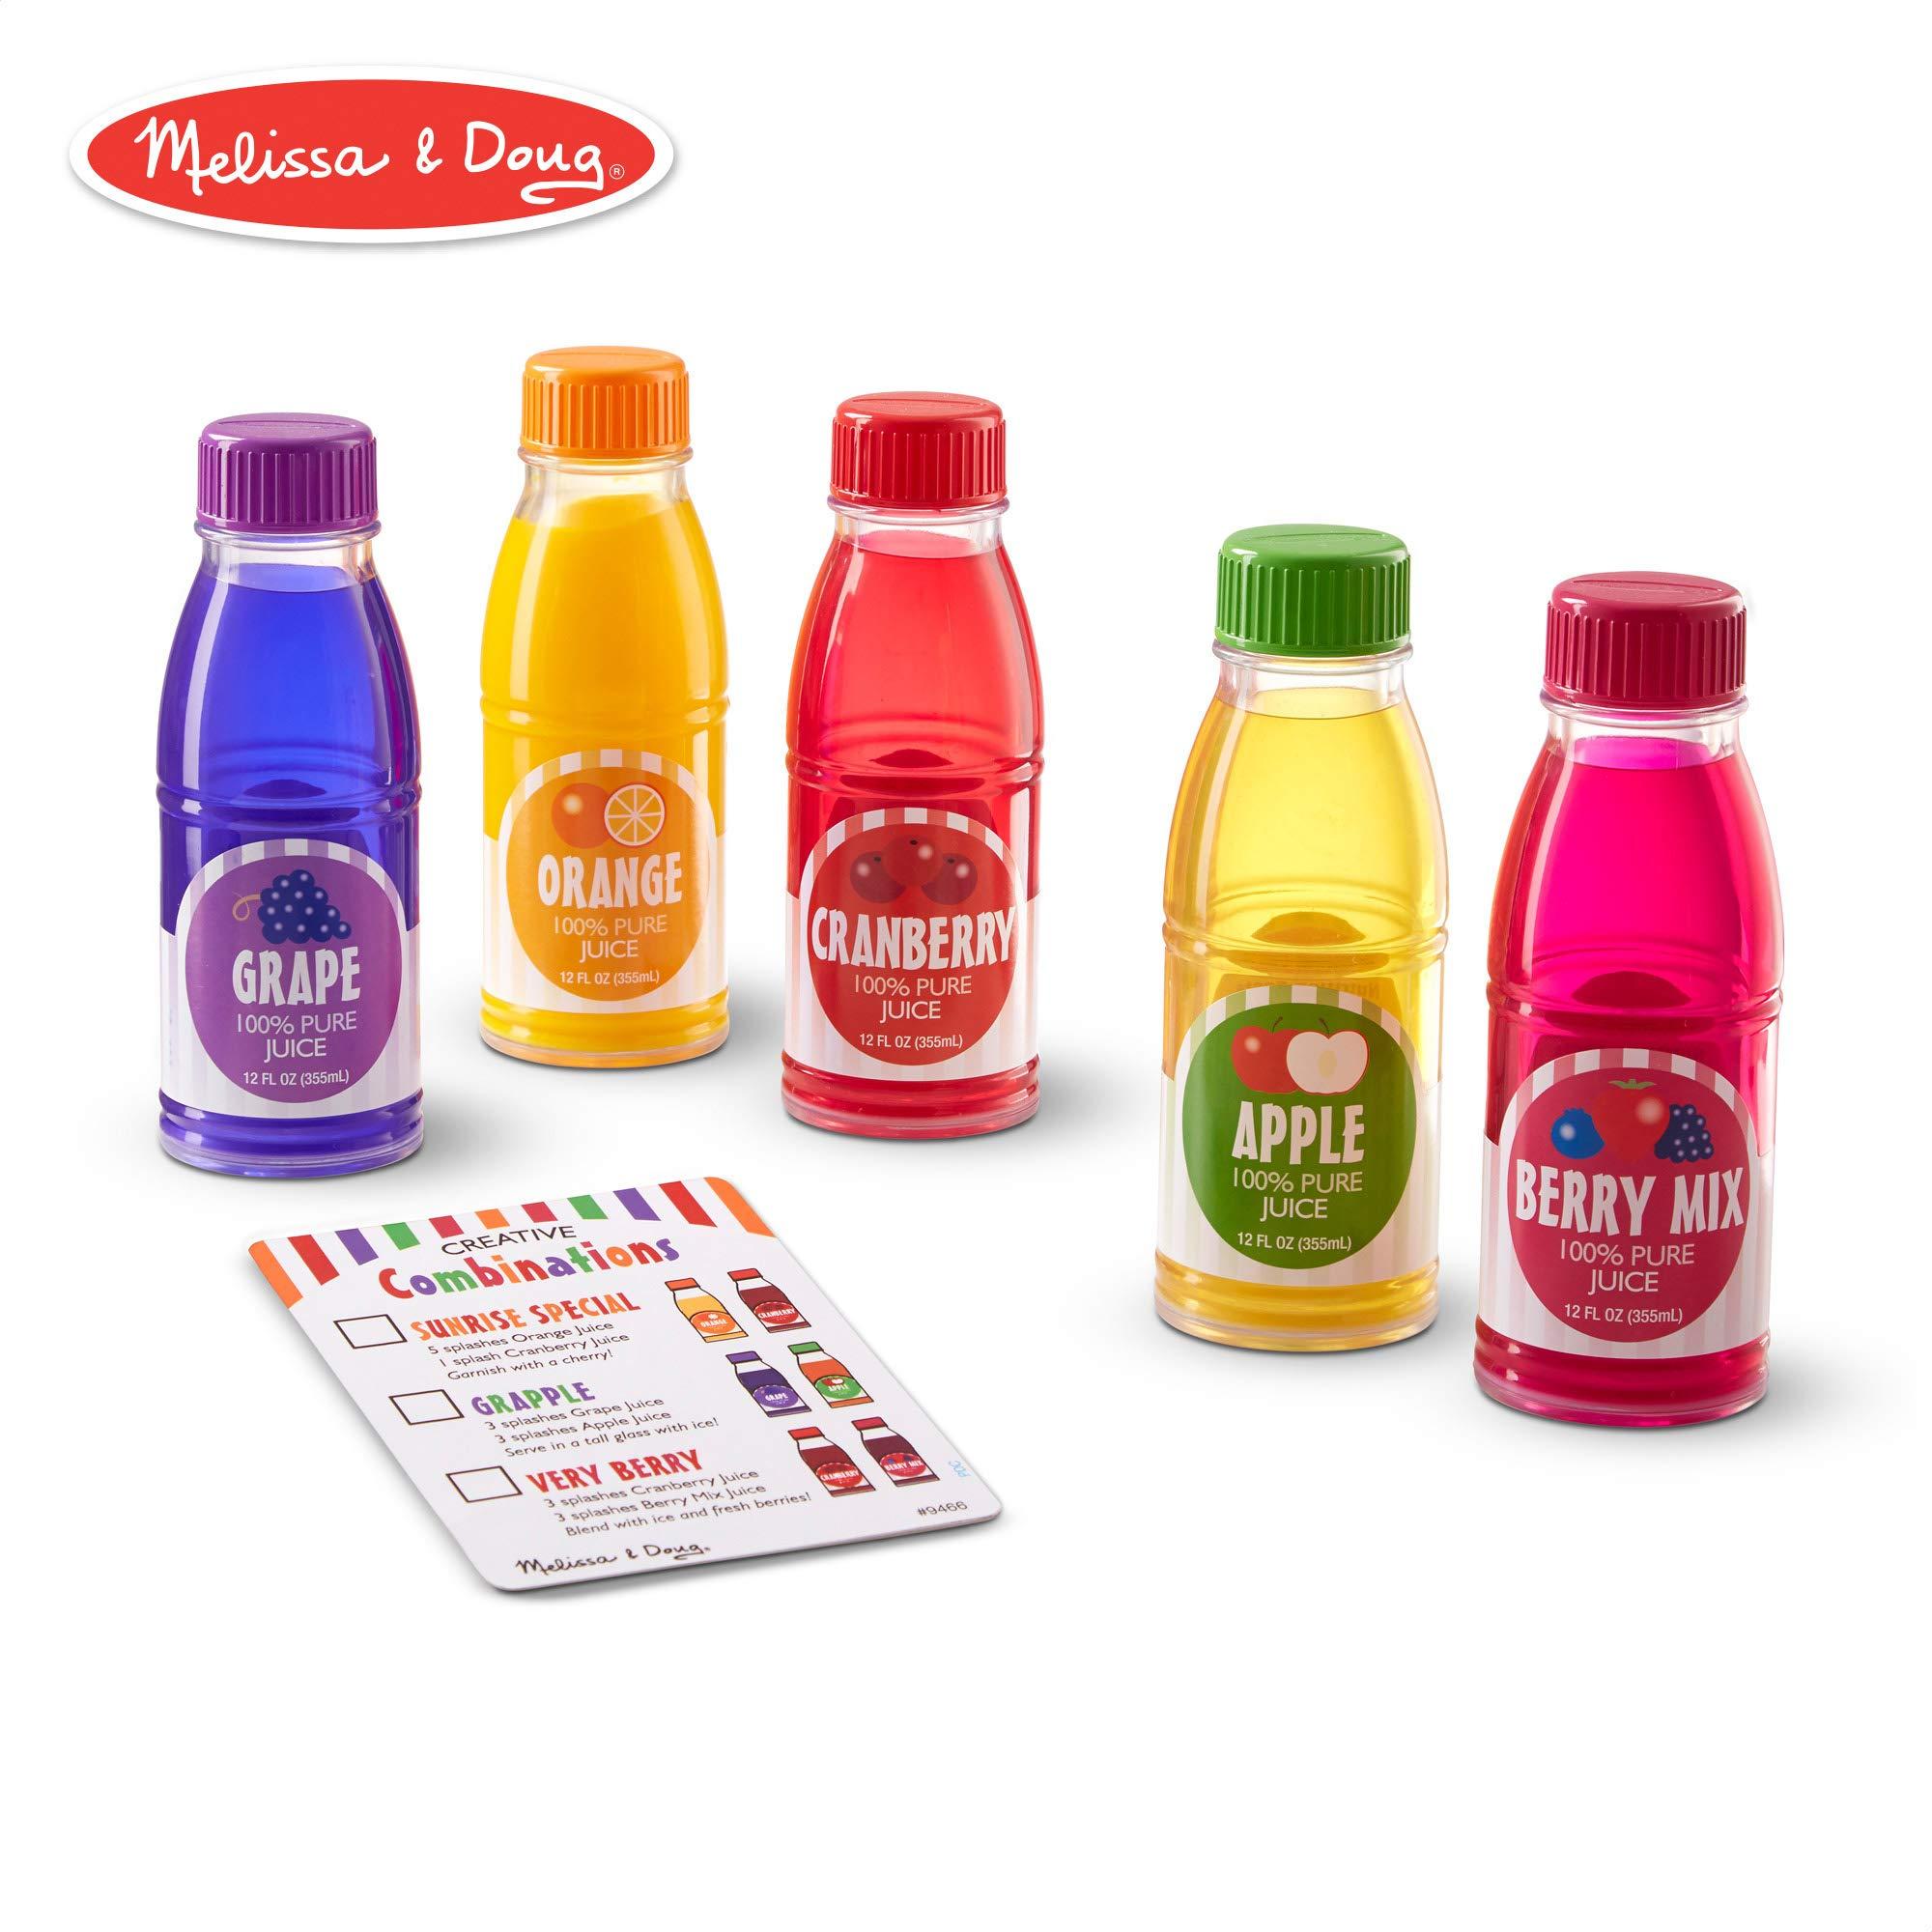 Melissa & Doug Tip & Sip Toy Juice Bottles (Play Food Set, 6 Pieces)